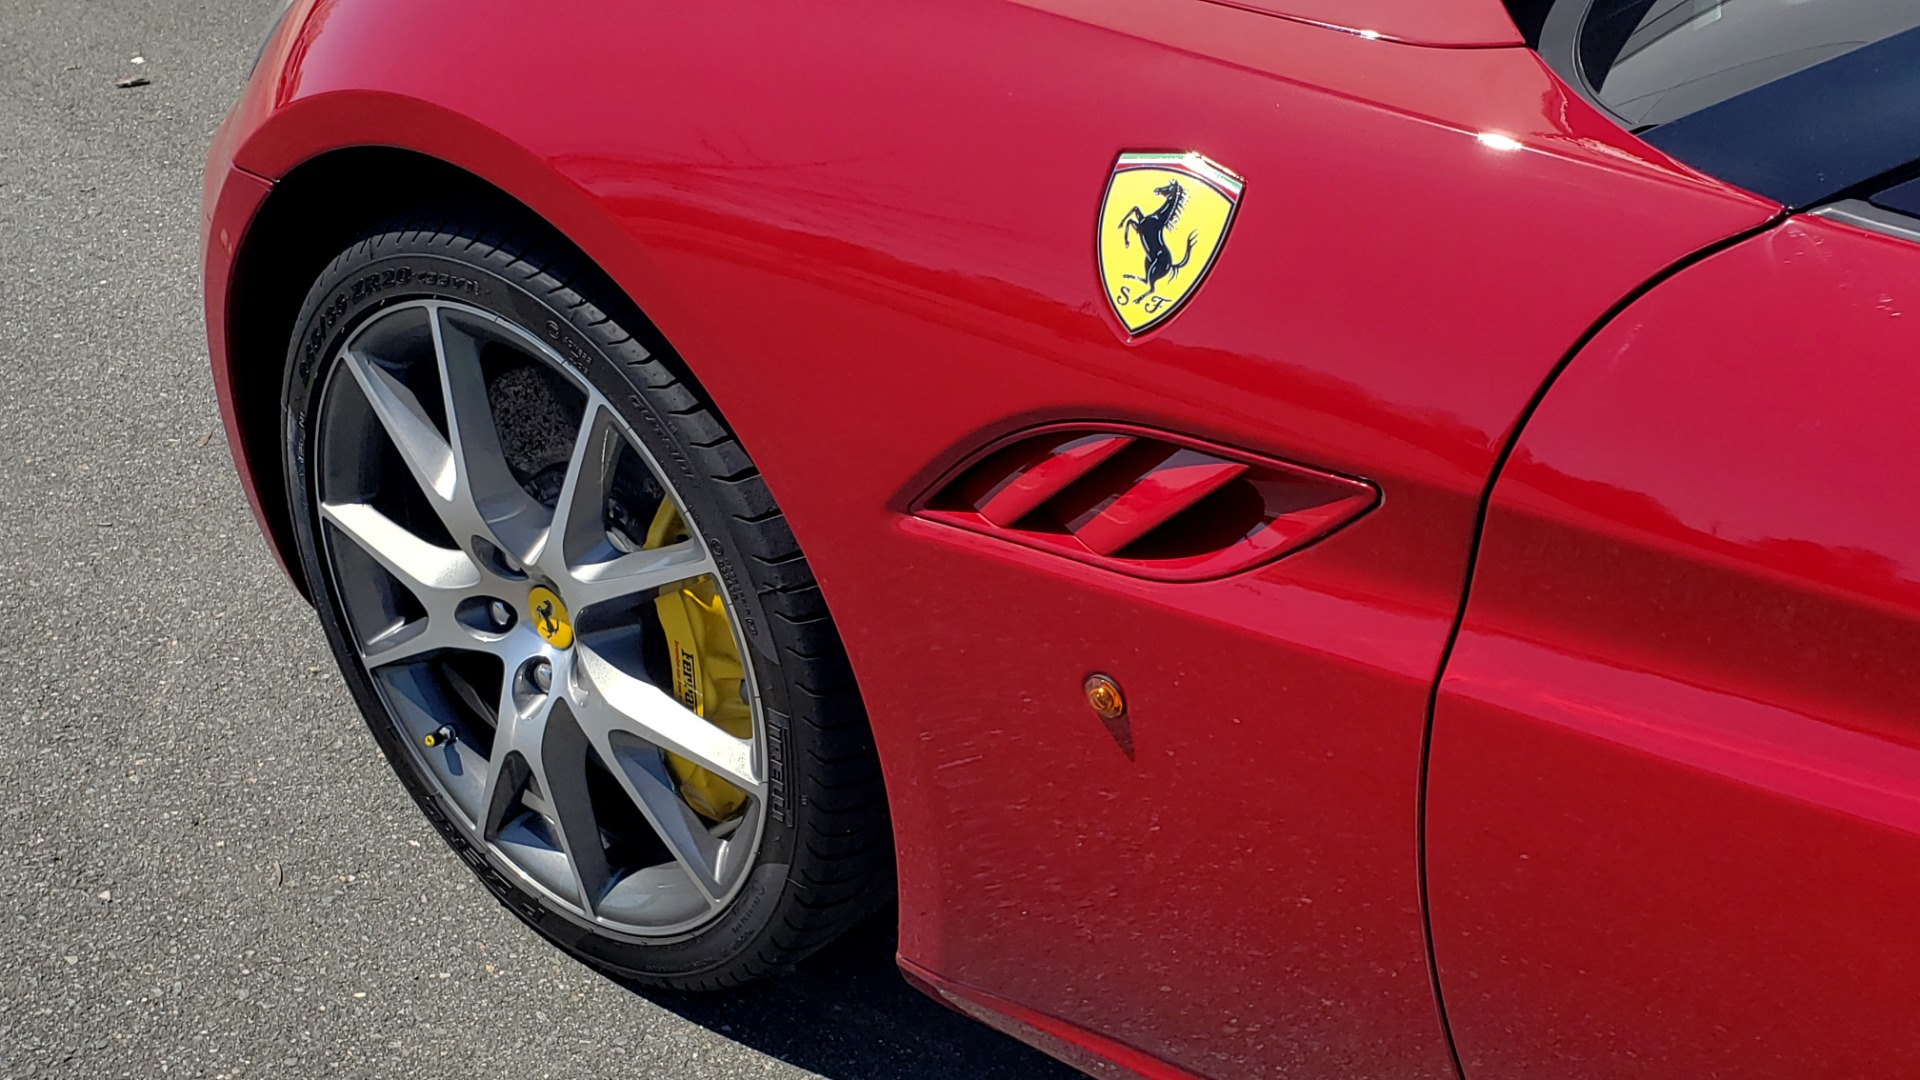 Used 2014 Ferrari CALIFORNIA CONVERTIBLE 2+2 / NAV / PARK SENS / CAMERA / TPMS for sale Sold at Formula Imports in Charlotte NC 28227 18